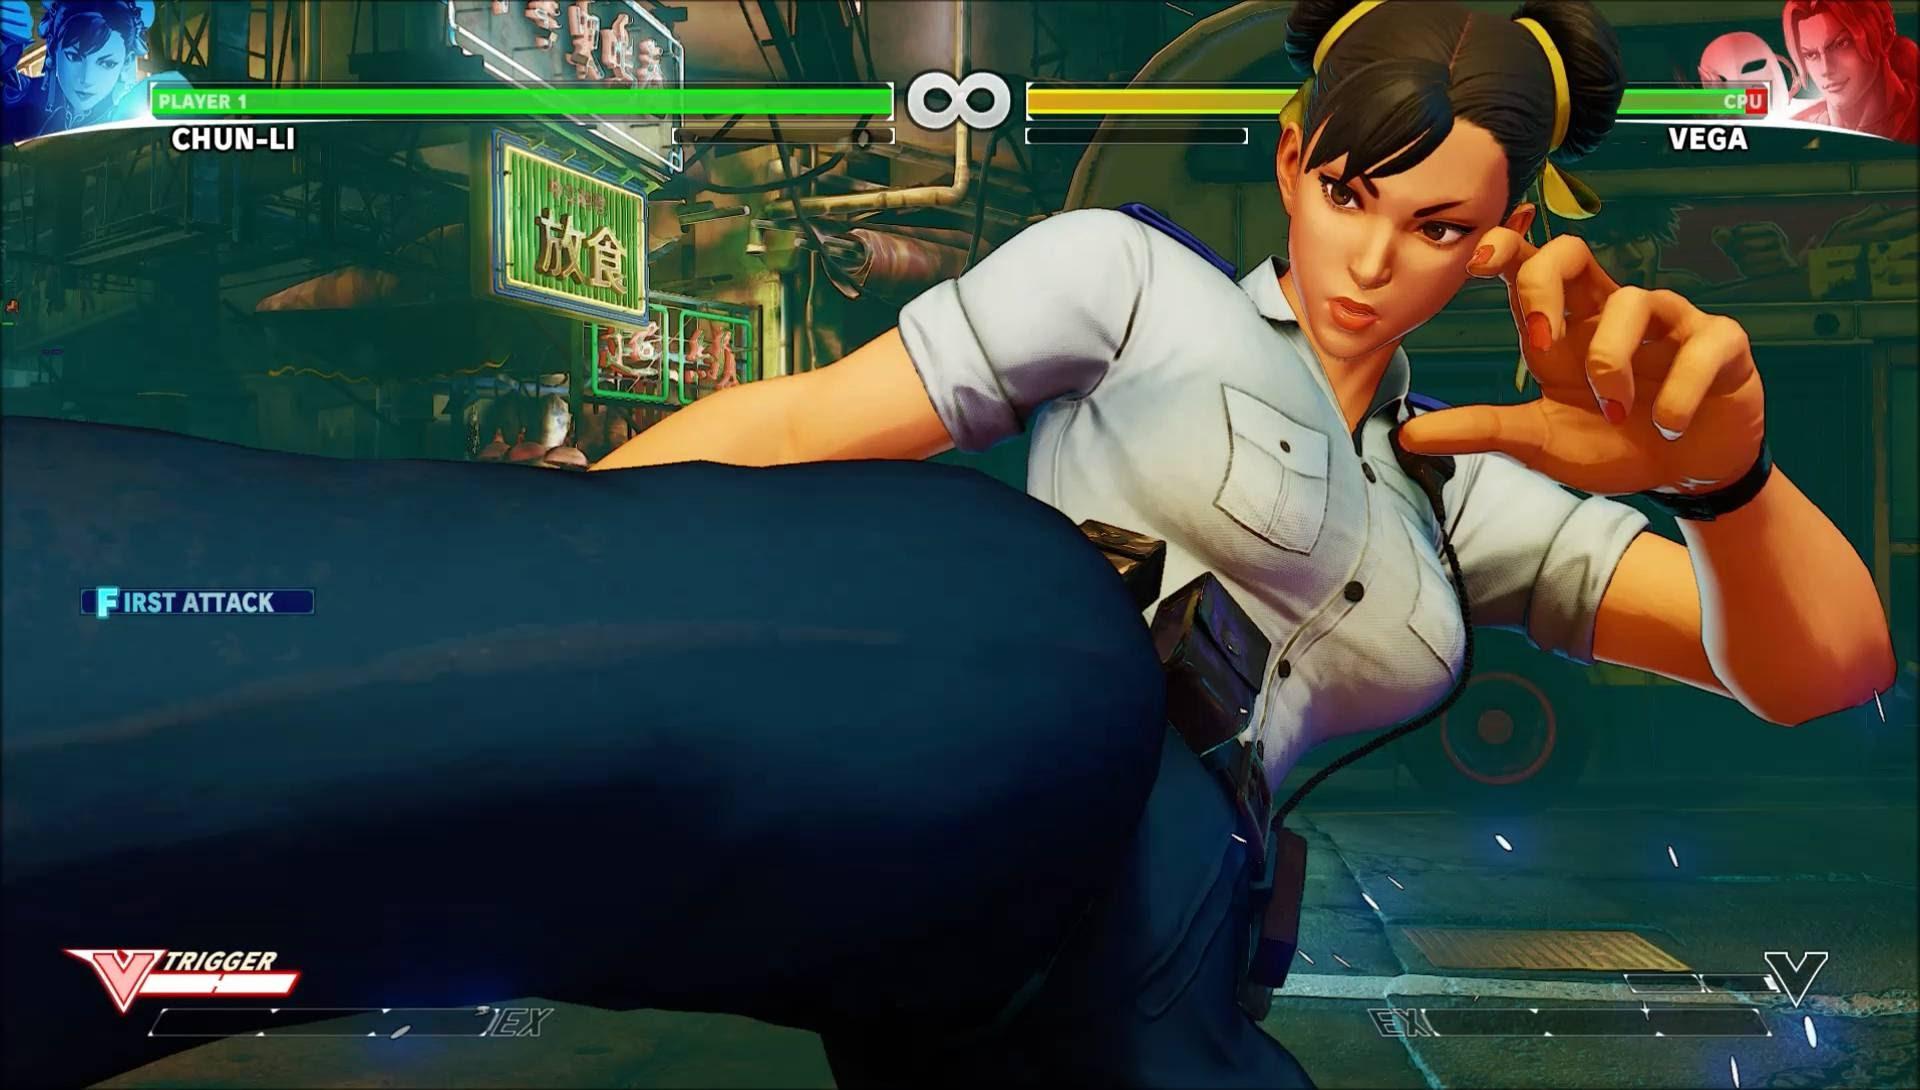 Le costume de Chun-Li tiré de son mode histoire.